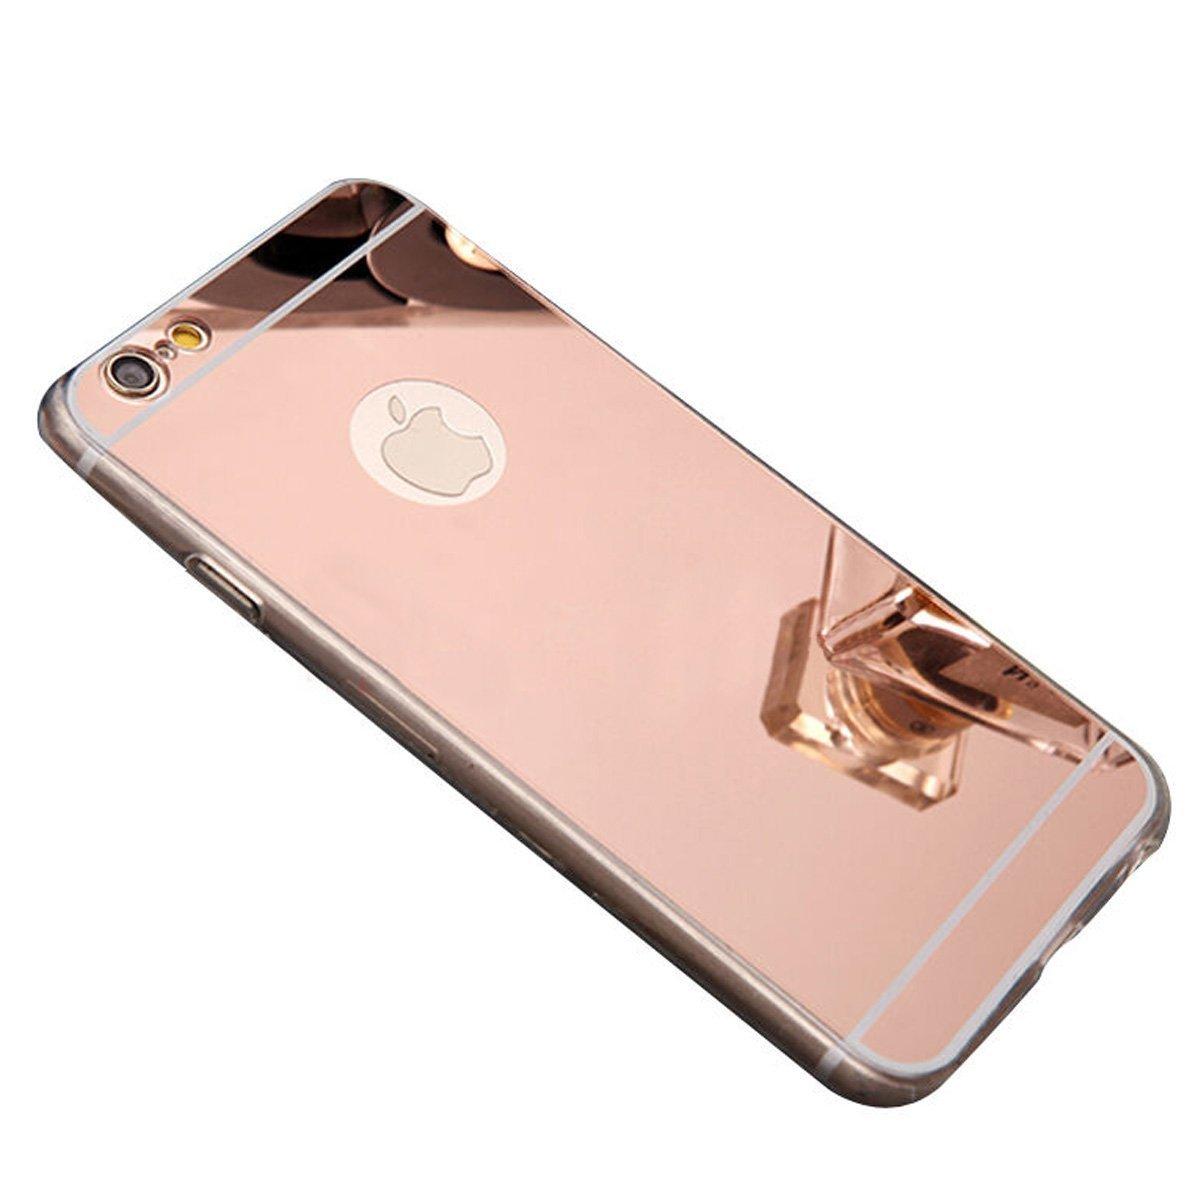 Zrcadlový kryt My Mirror pro iPhone 6s Plus / 6 Plus - Růžově zlatý (rose gold)